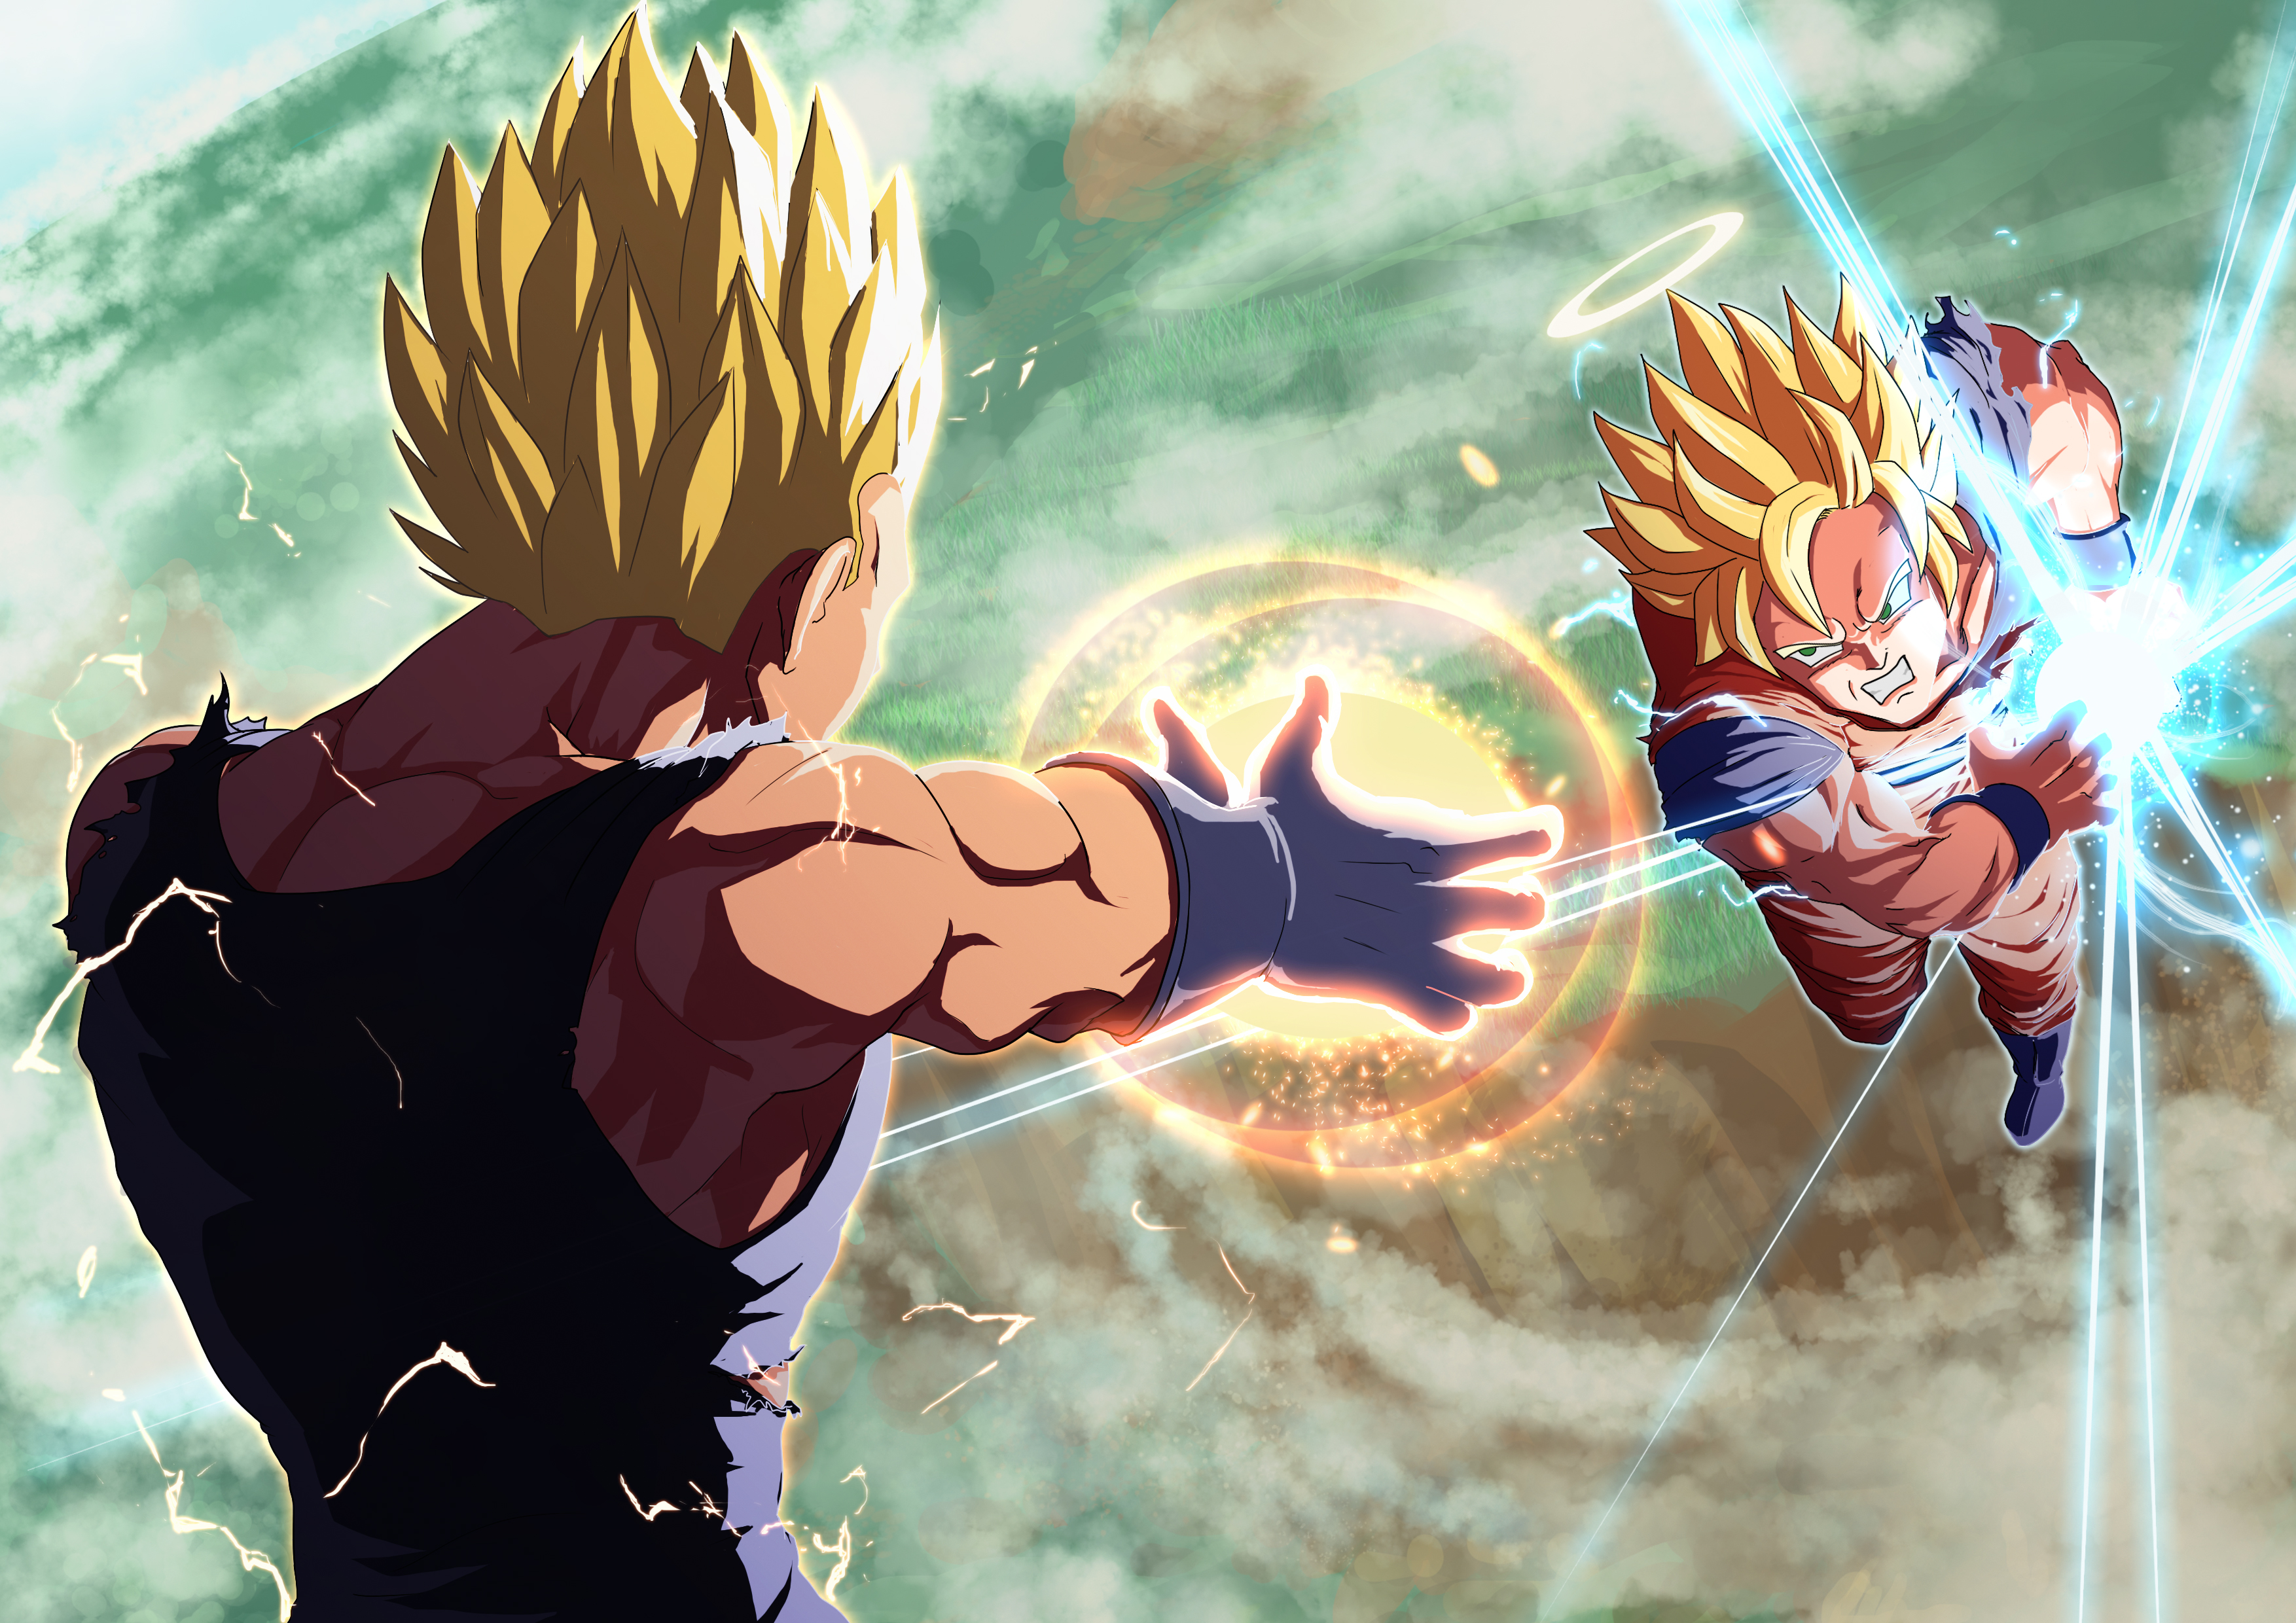 Legends Goku And Vegeta Daily Anime Art